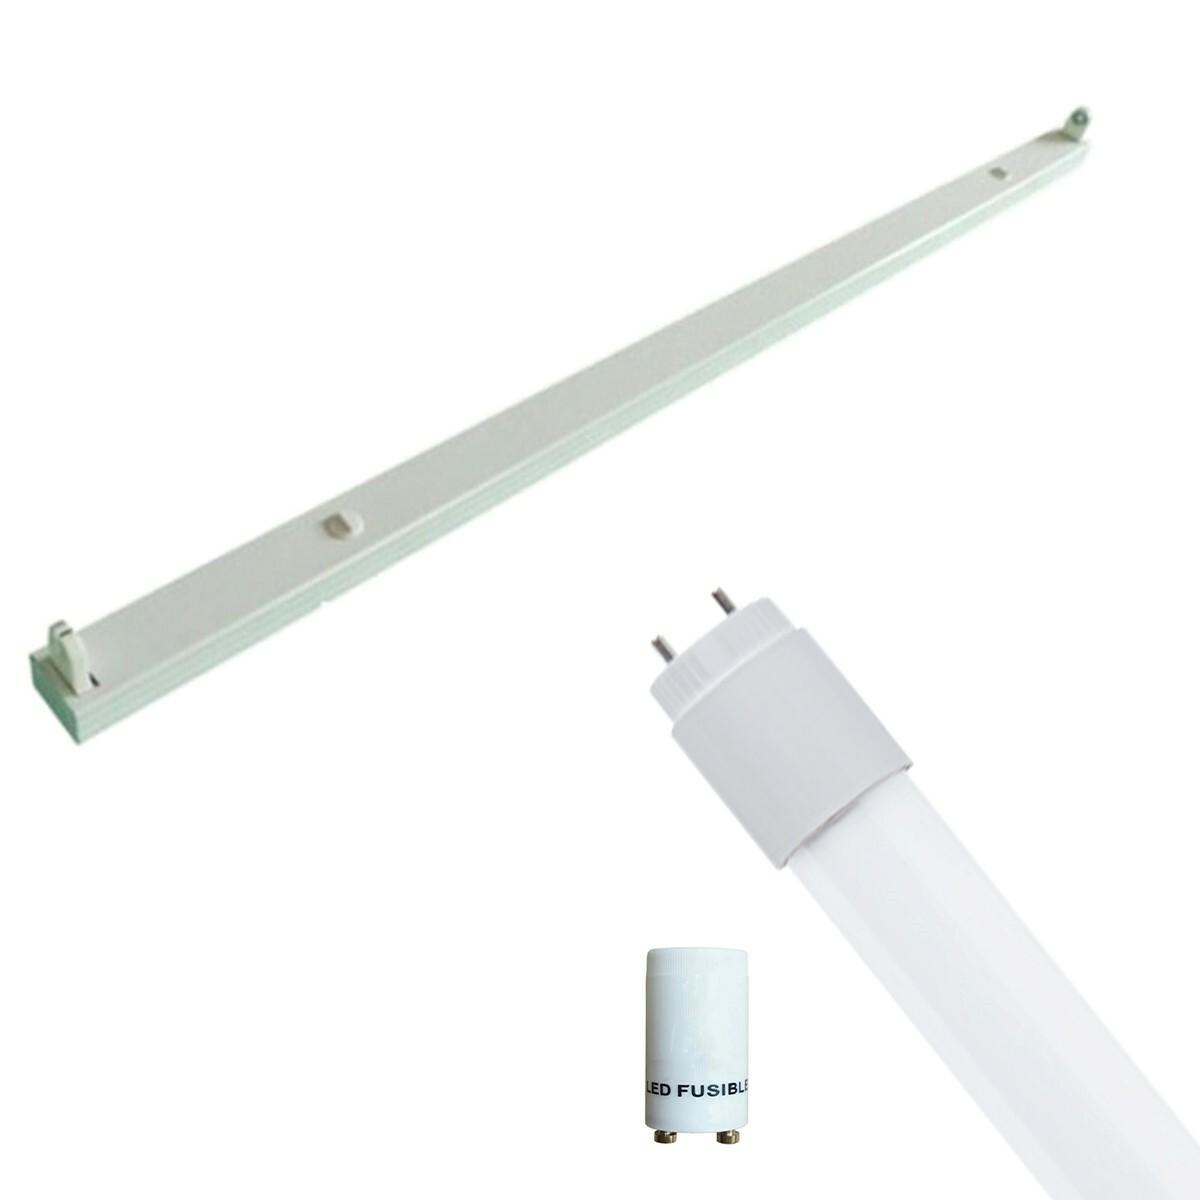 LED TL Armatuur met T8 Buis Incl. Starter - Aigi Dybolo - 150cm Enkel - 22W - Helder/Koud Wit 6400K